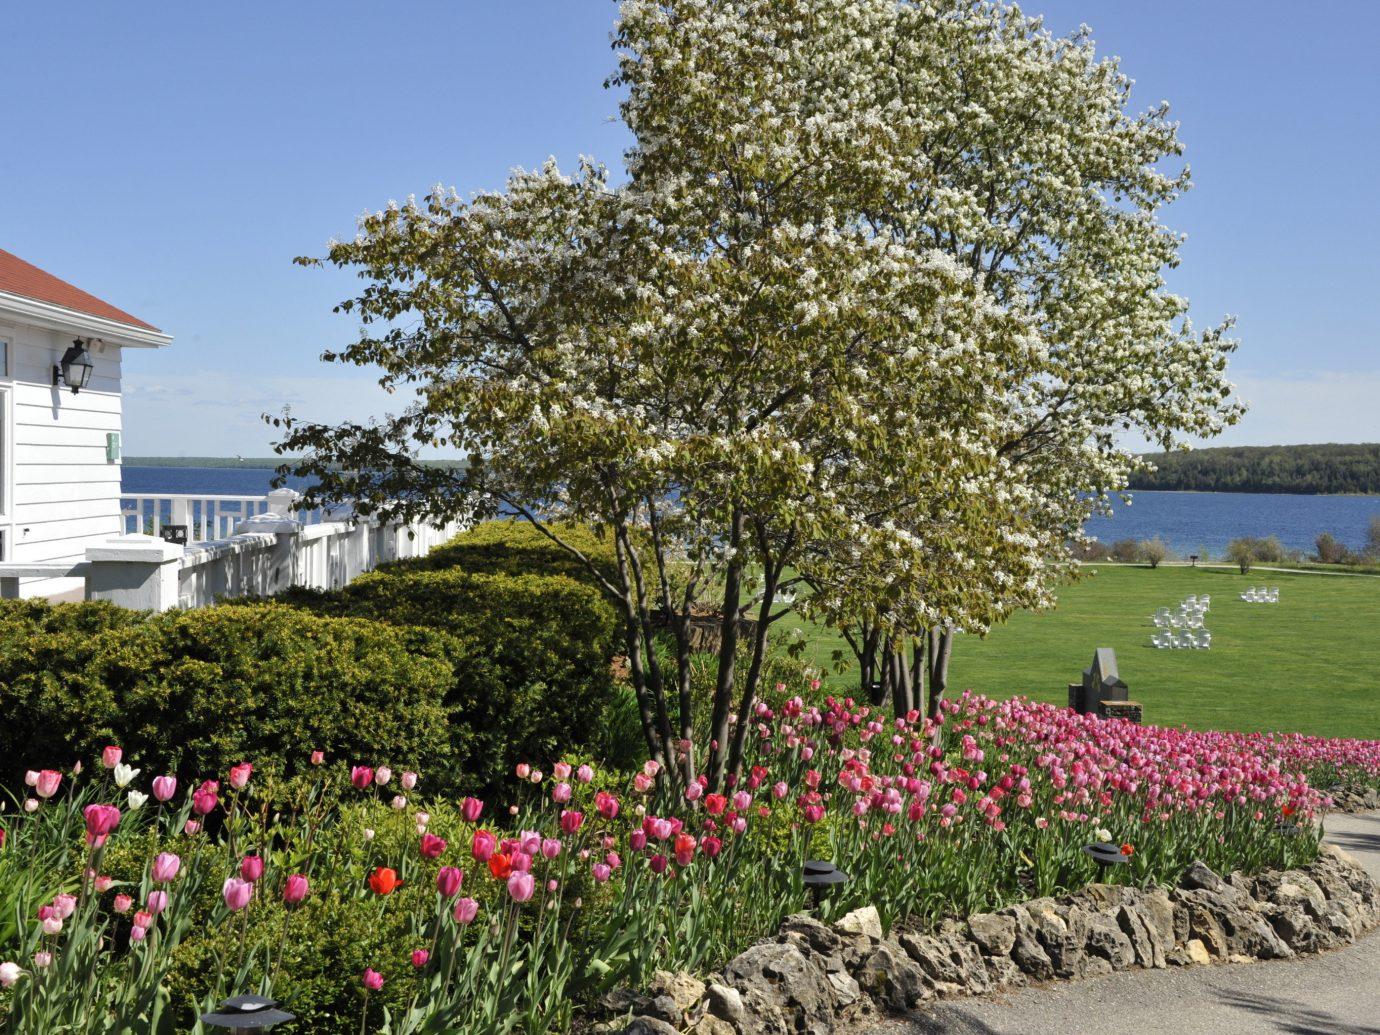 Hotels Lakes + Rivers tree outdoor sky flower plant flora botany land plant woody plant Garden flowering plant estate park blossom shrub lawn